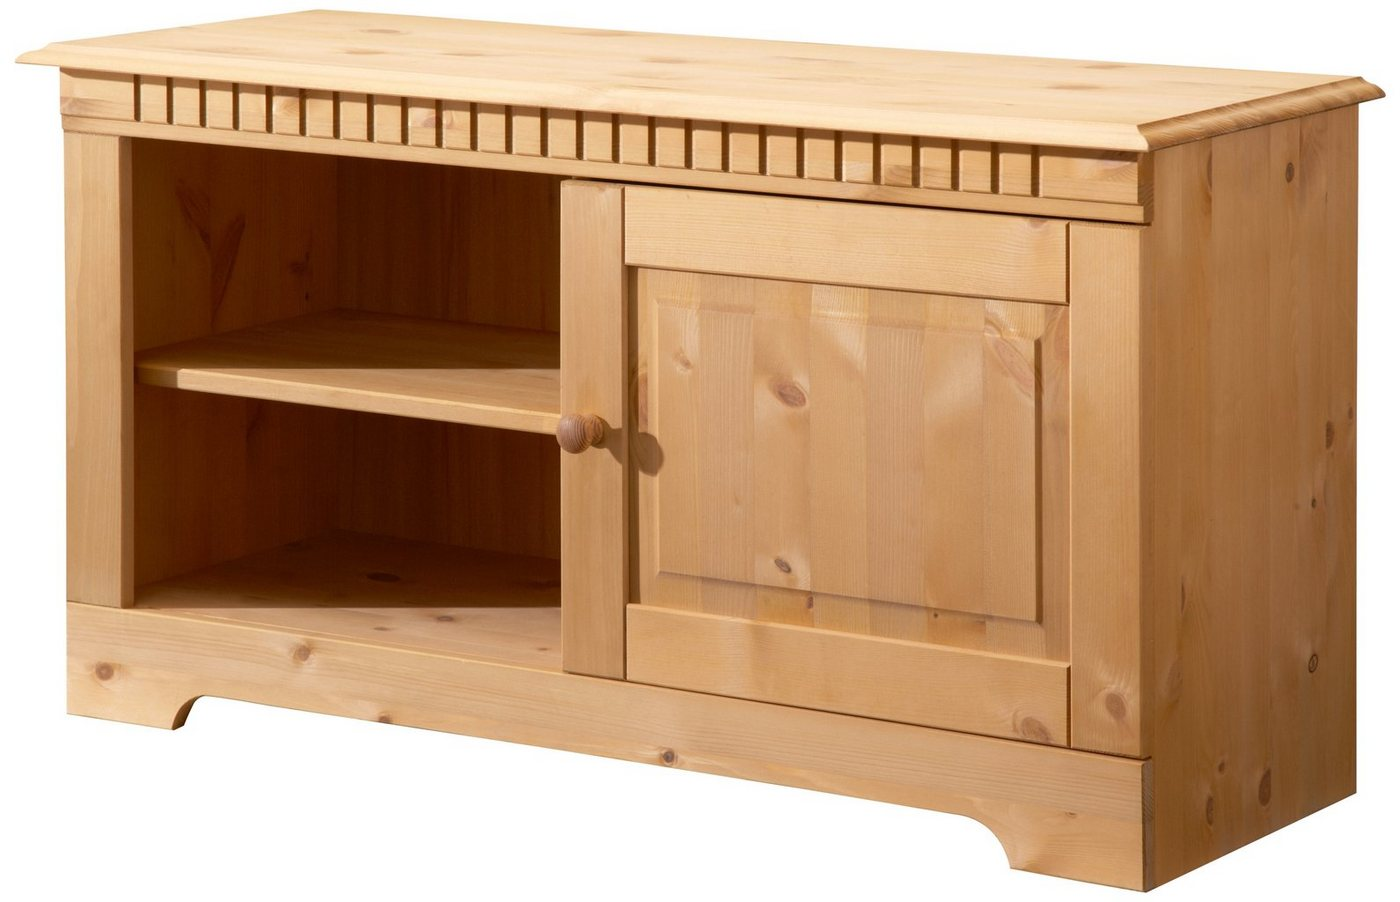 HOME AFFAIRE TV-lowboard breedte 94 cm